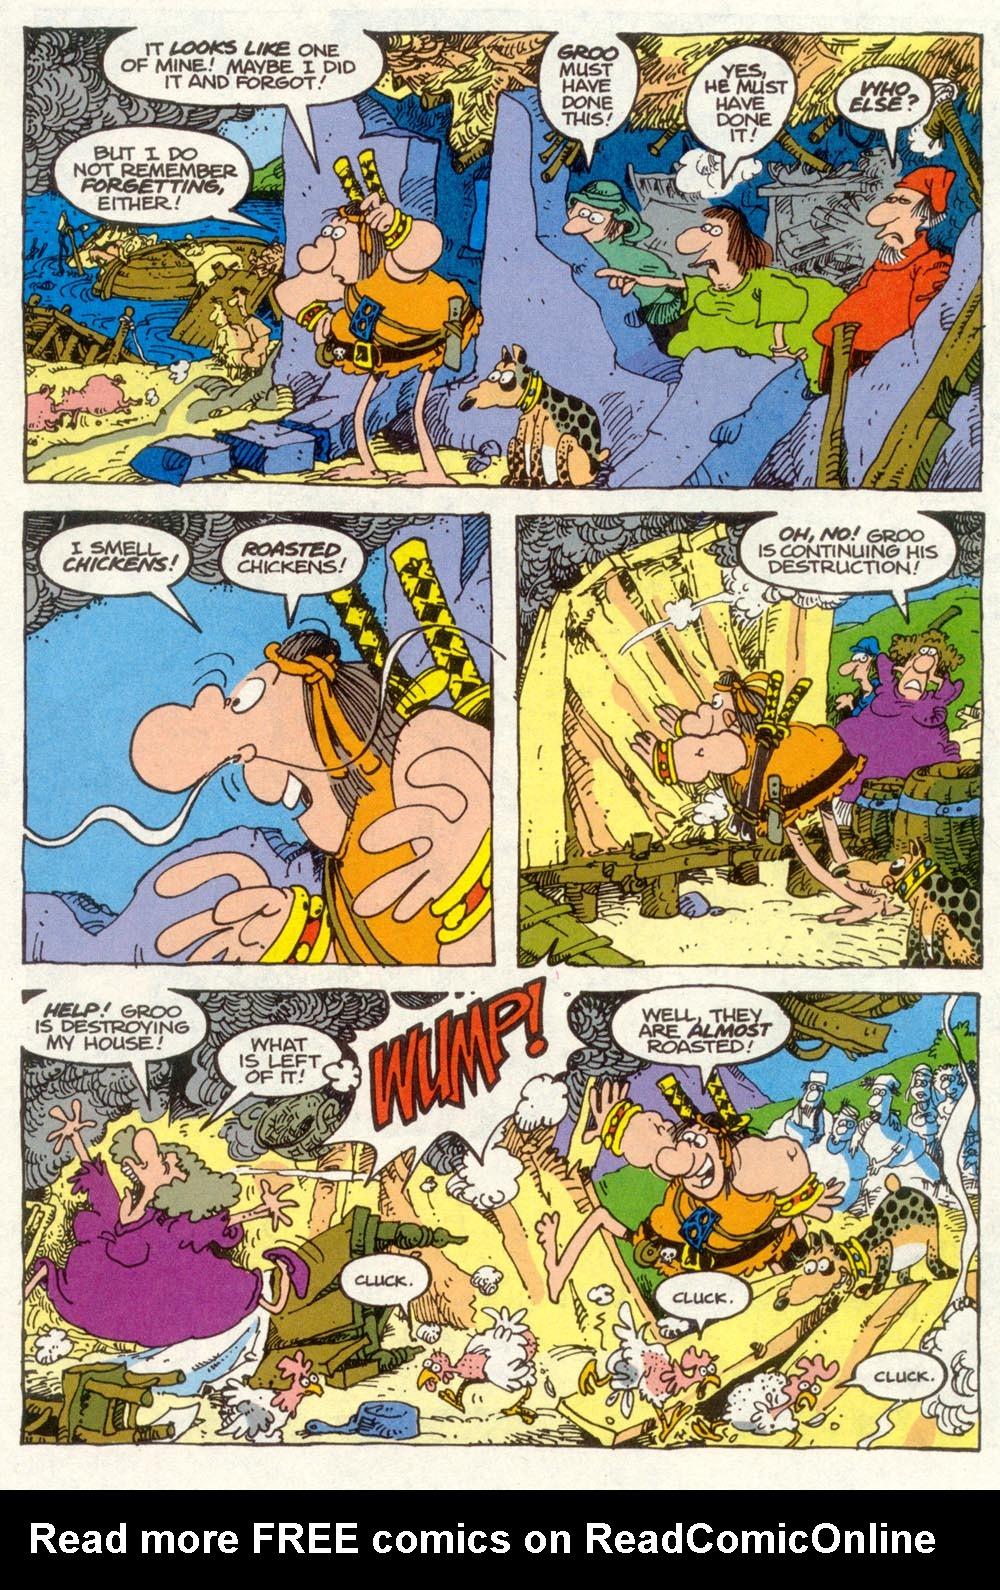 Read online Sergio Aragonés Groo the Wanderer comic -  Issue #90 - 5